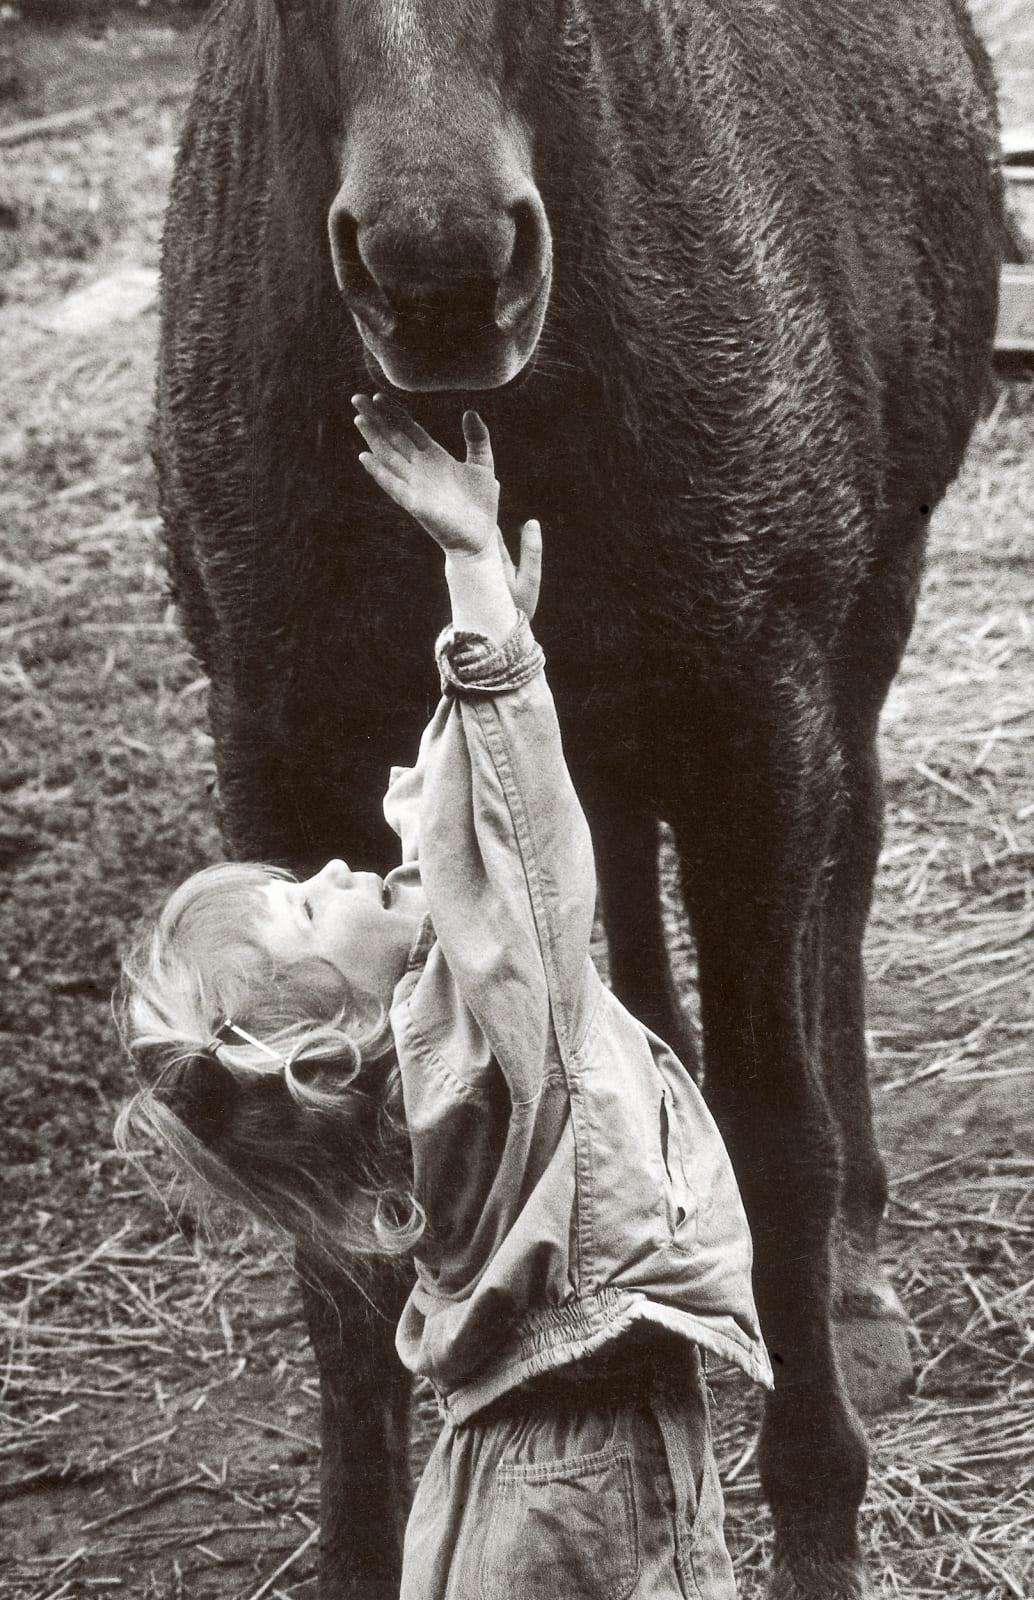 Meg Reaching, late 1950s